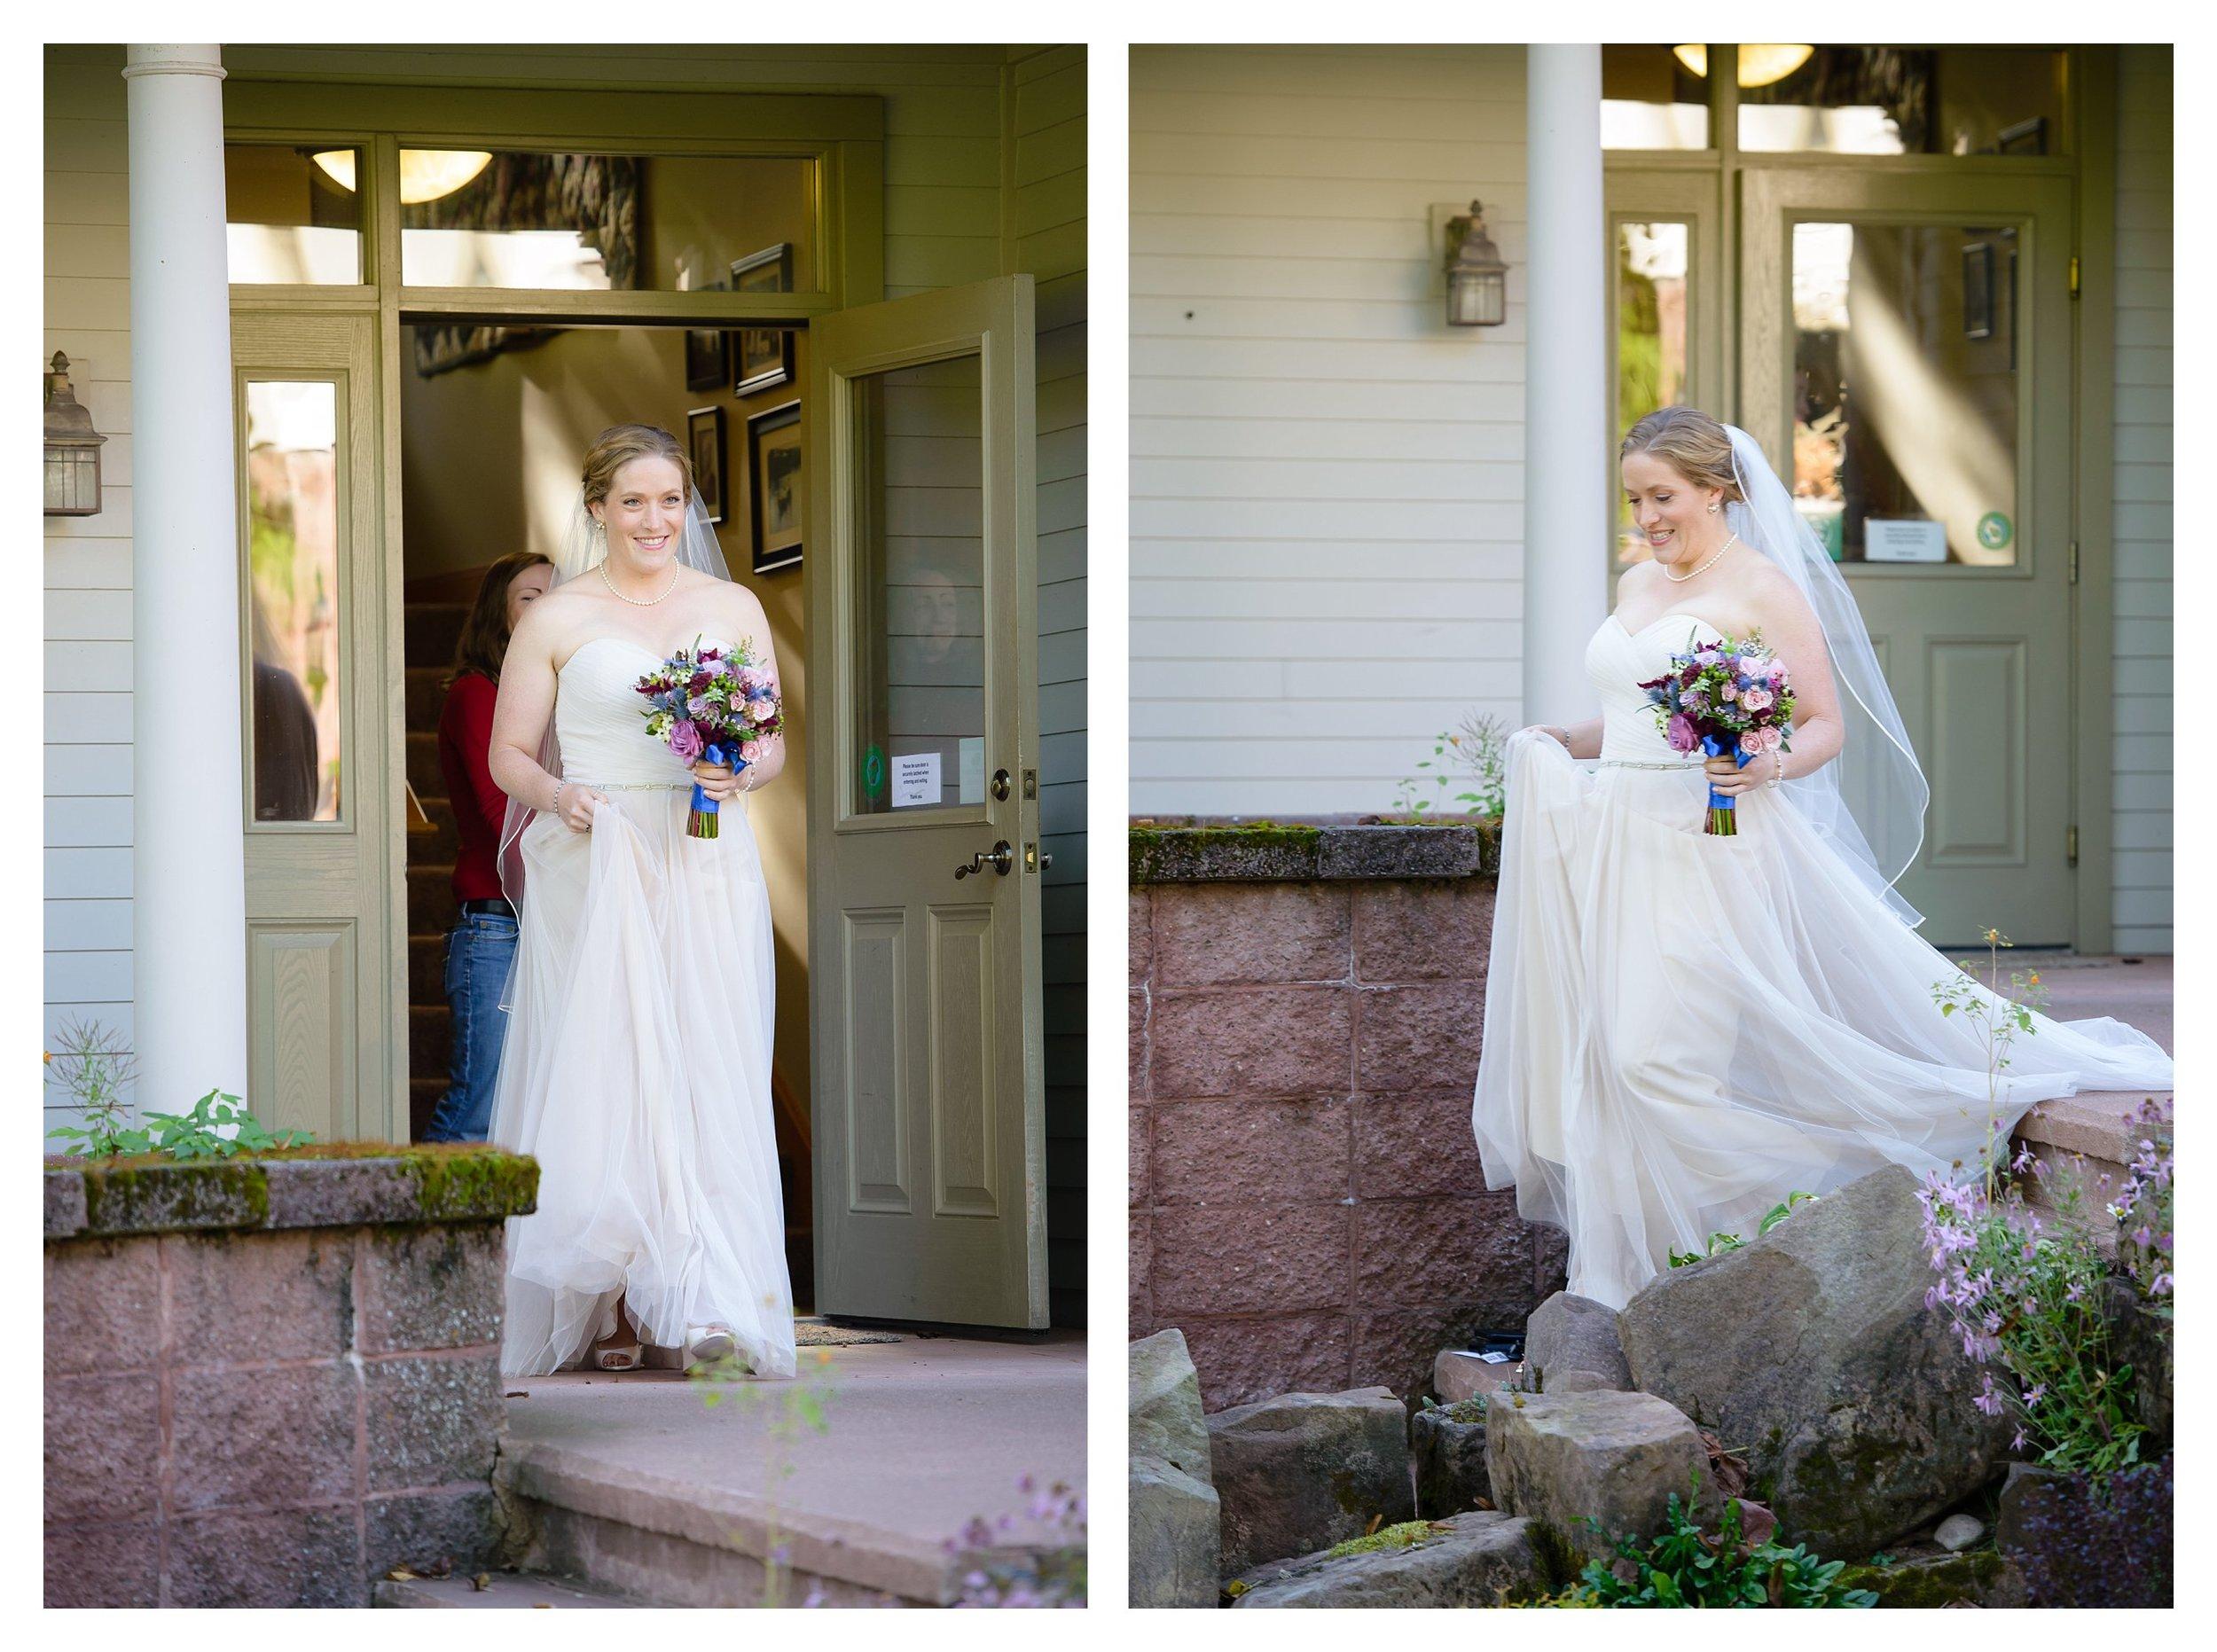 Lindstrom MN Twin cities Minnesota northwoods Bayfield wisconsin destination wedding ps 139 photography_0465.jpg